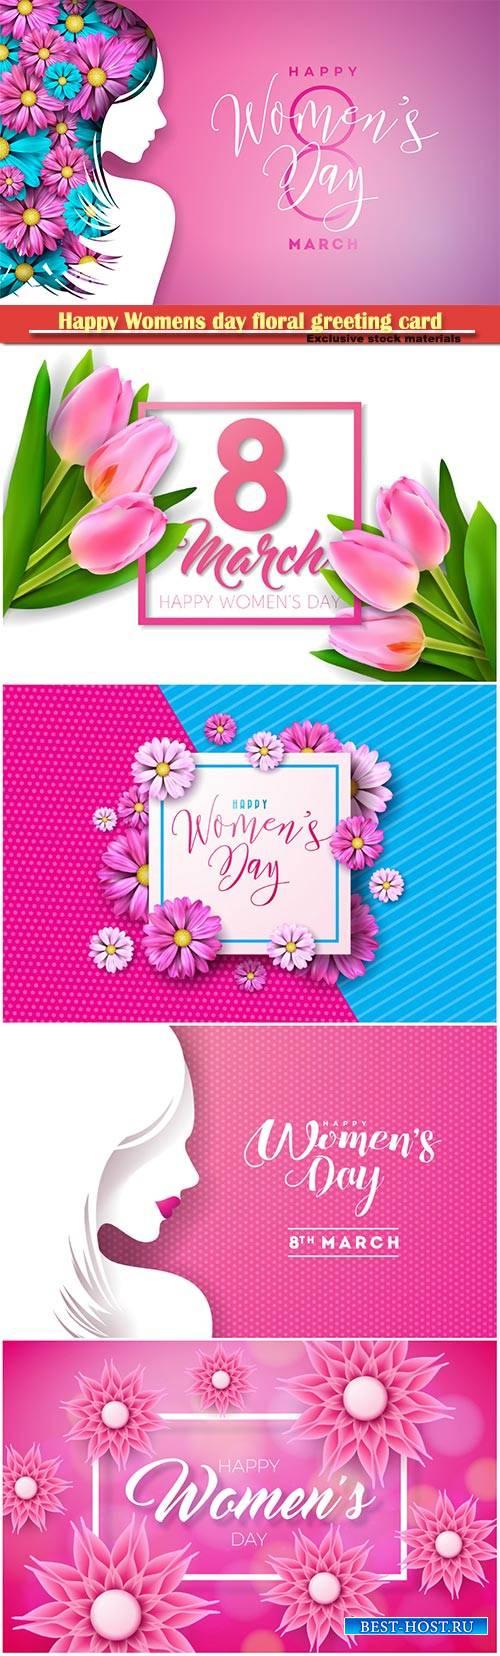 Happy Womens day floral greeting card, international female holiday Illustr ...